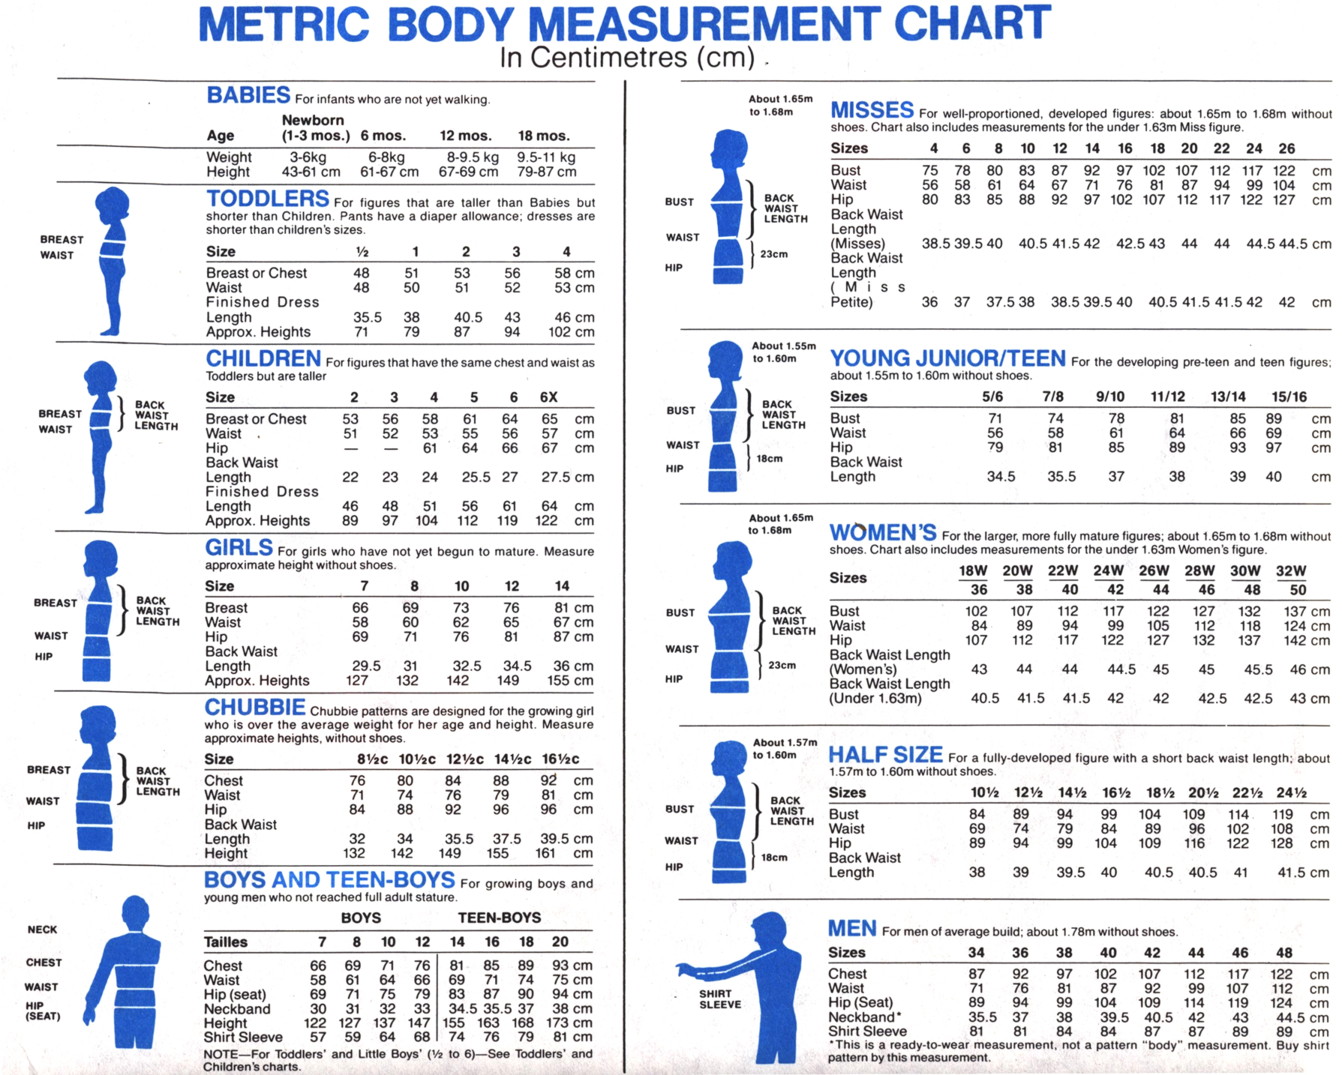 Free Printable Measurement Conversion Chart METRIC BODY - 1342x1075 ...